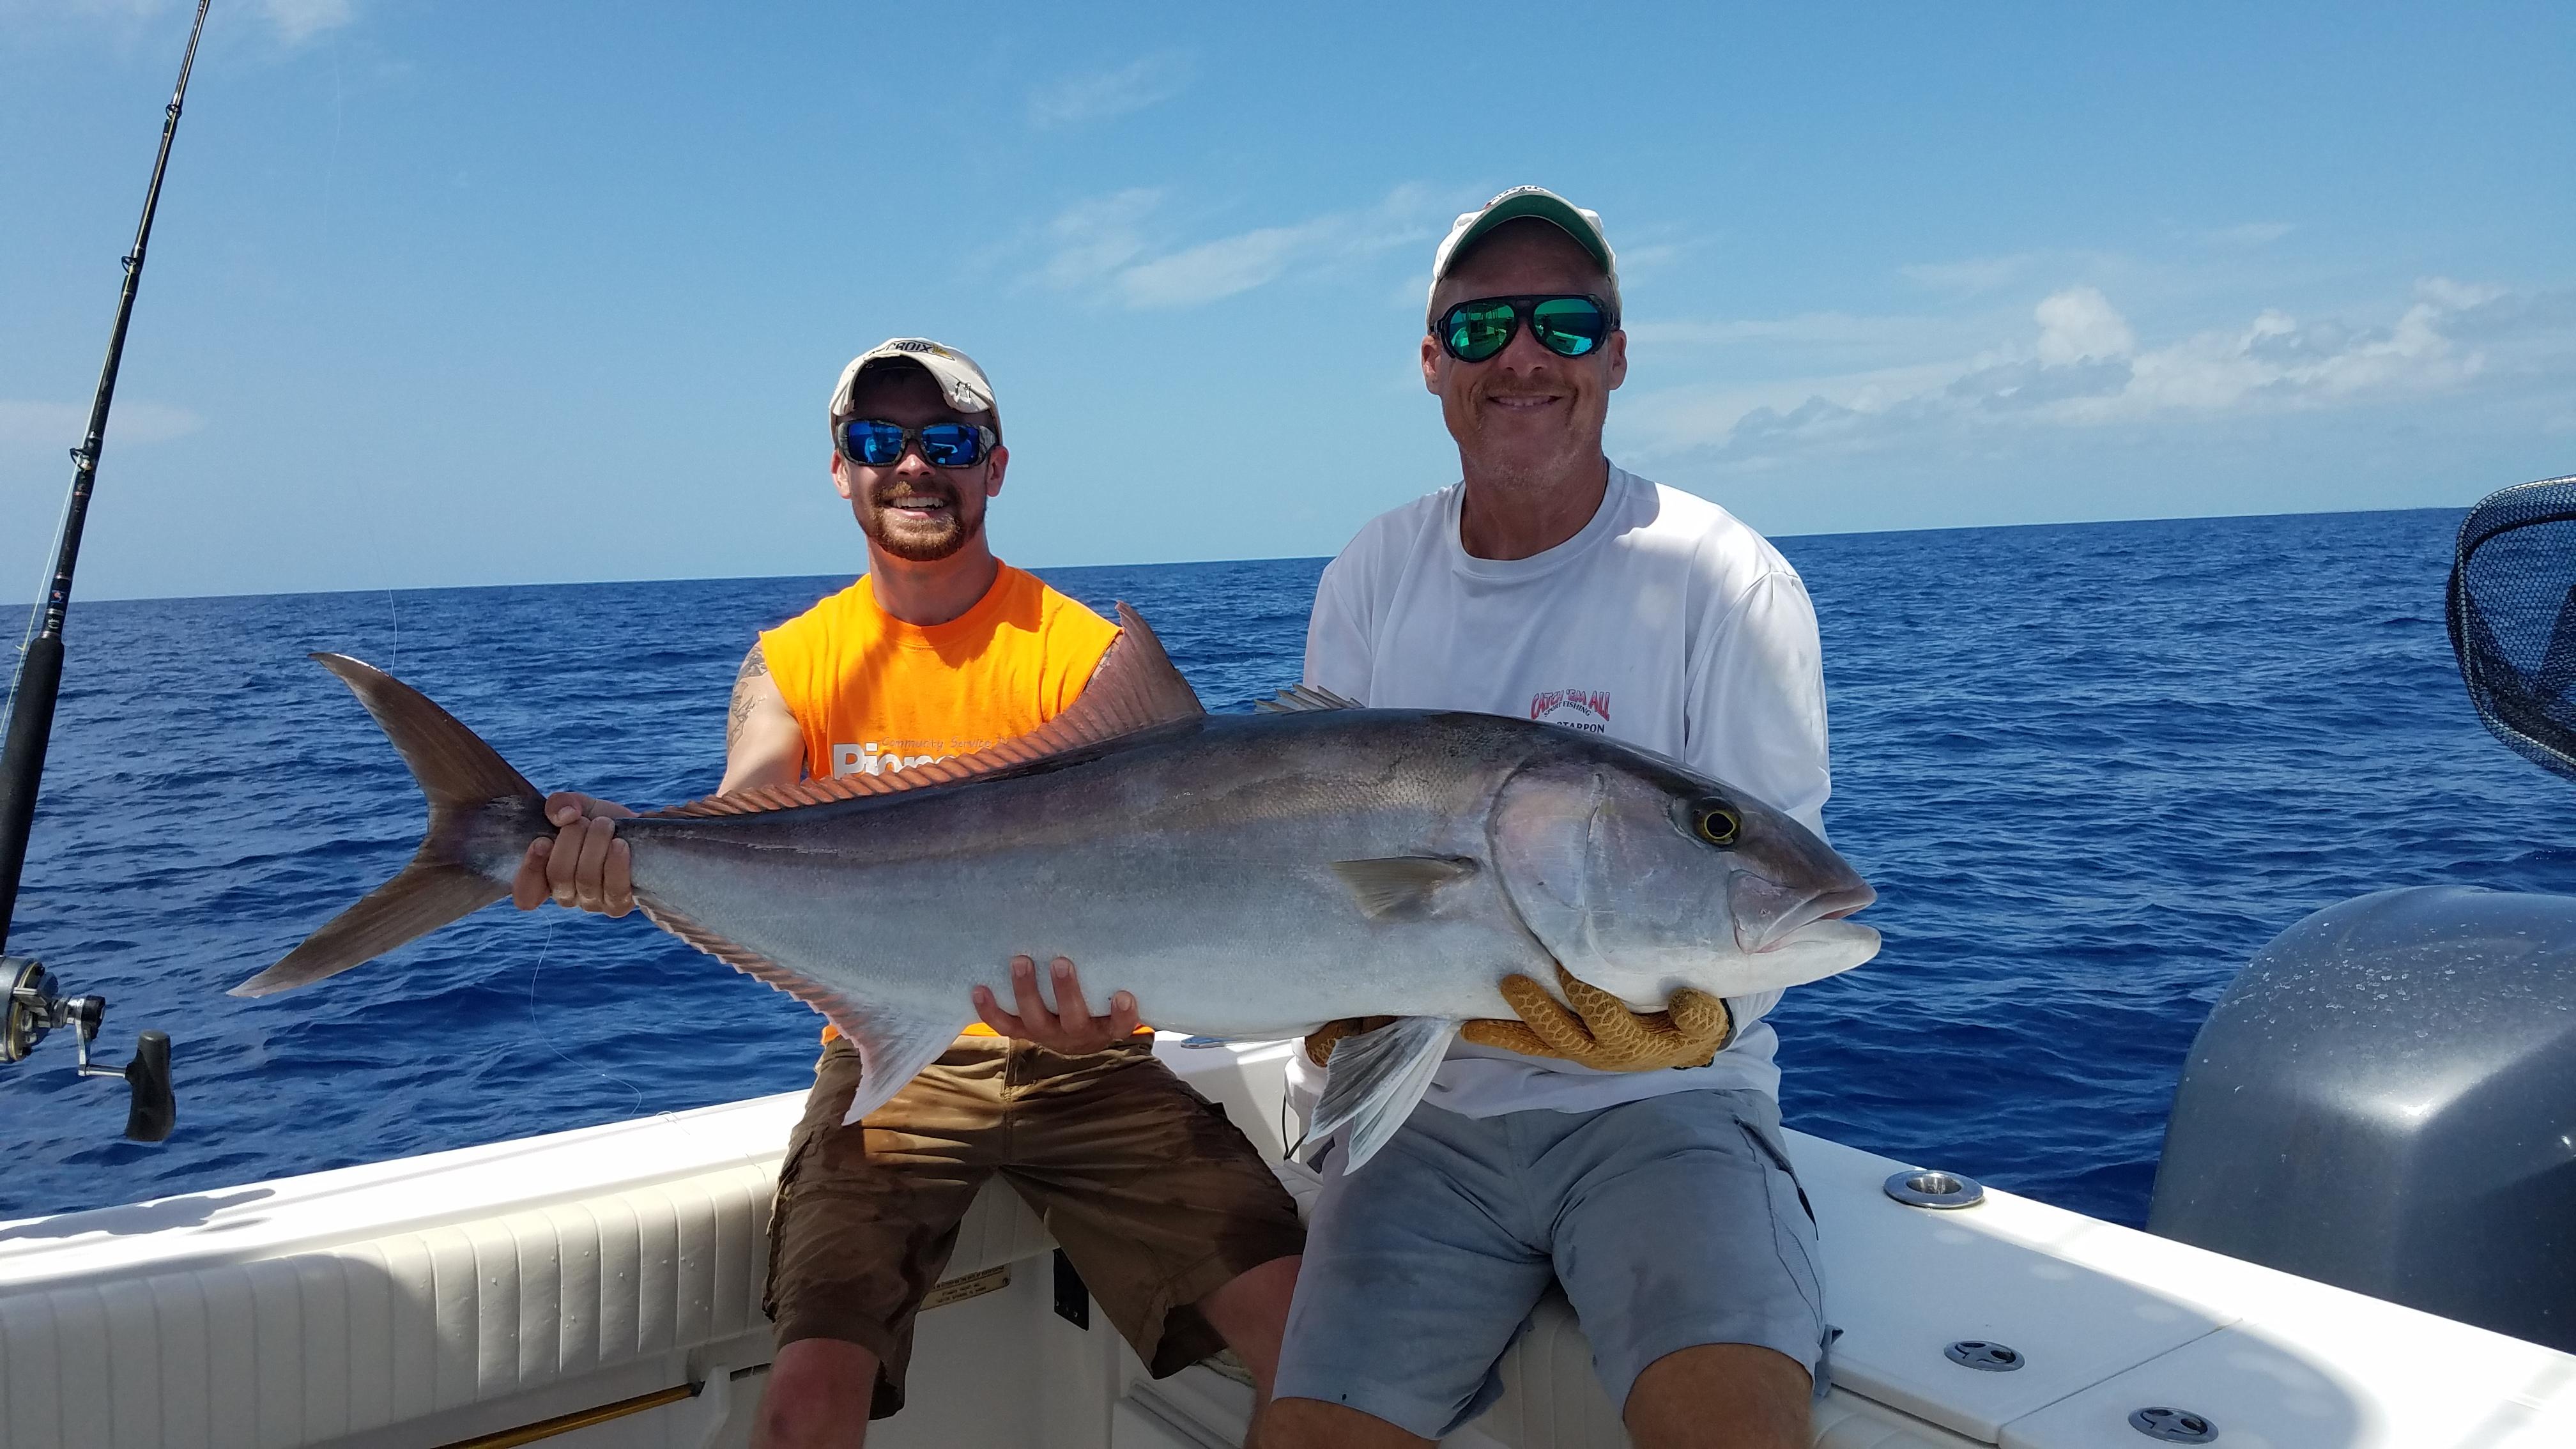 Amberjack action catch 39 em all florida keys fishing charters for Florida keys fishing